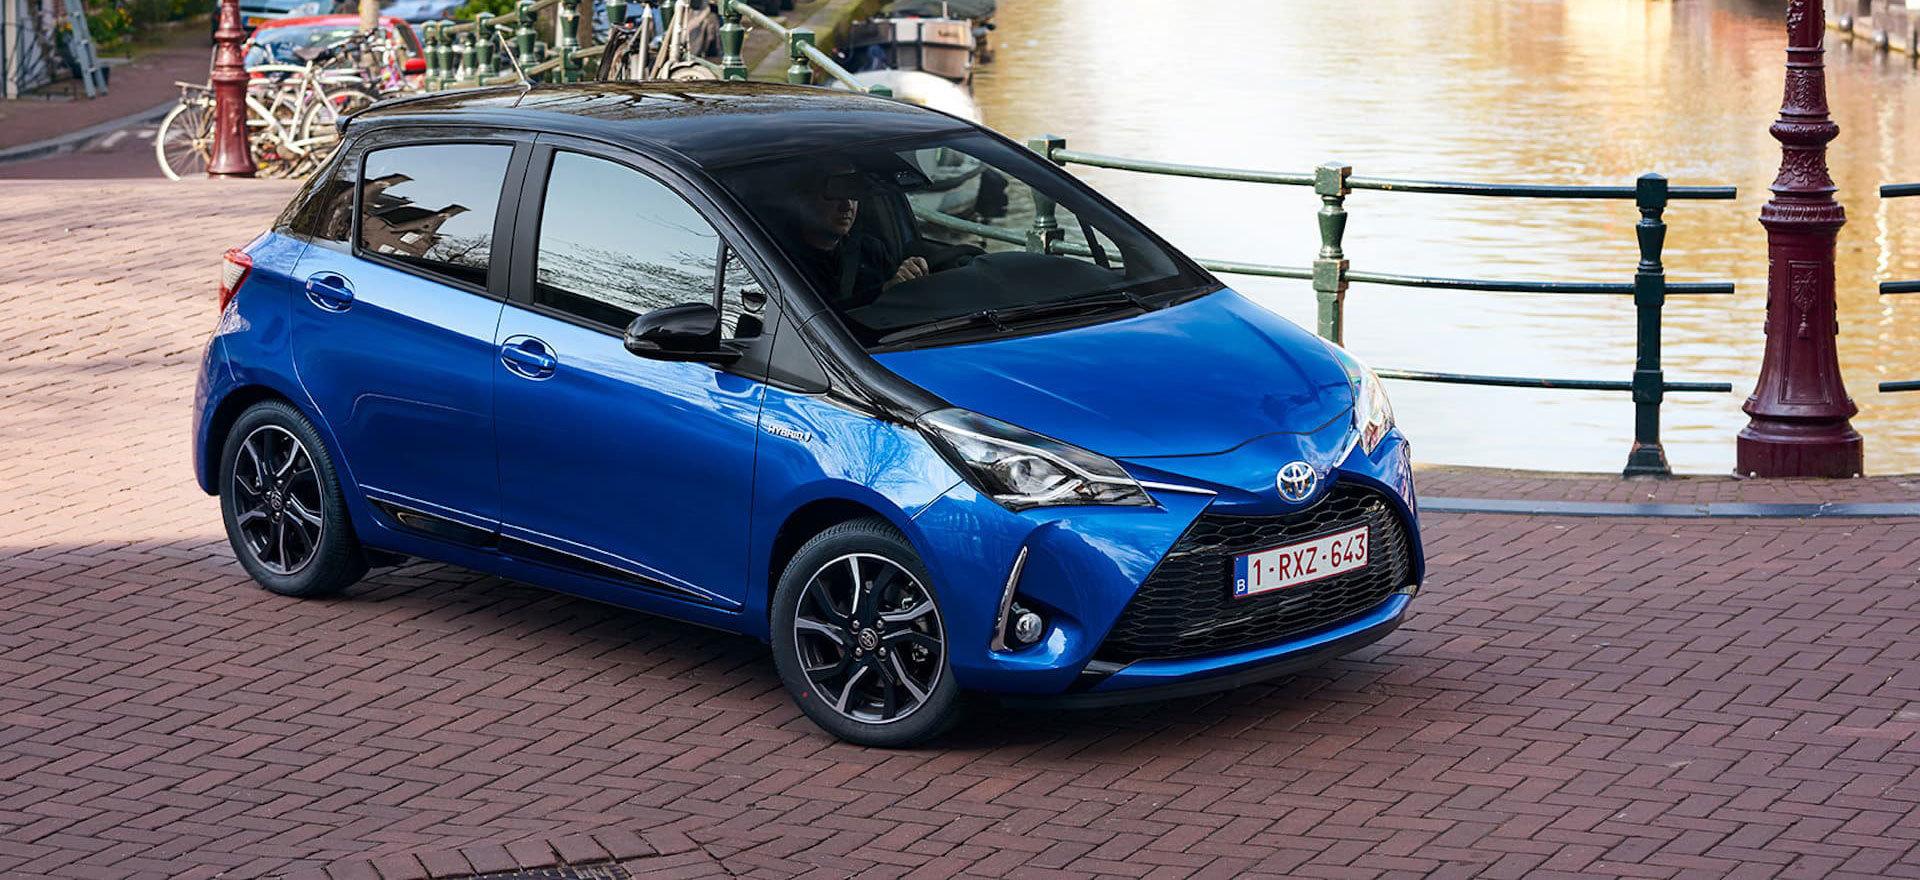 Toyota Yaris Oferta Mayo 2020